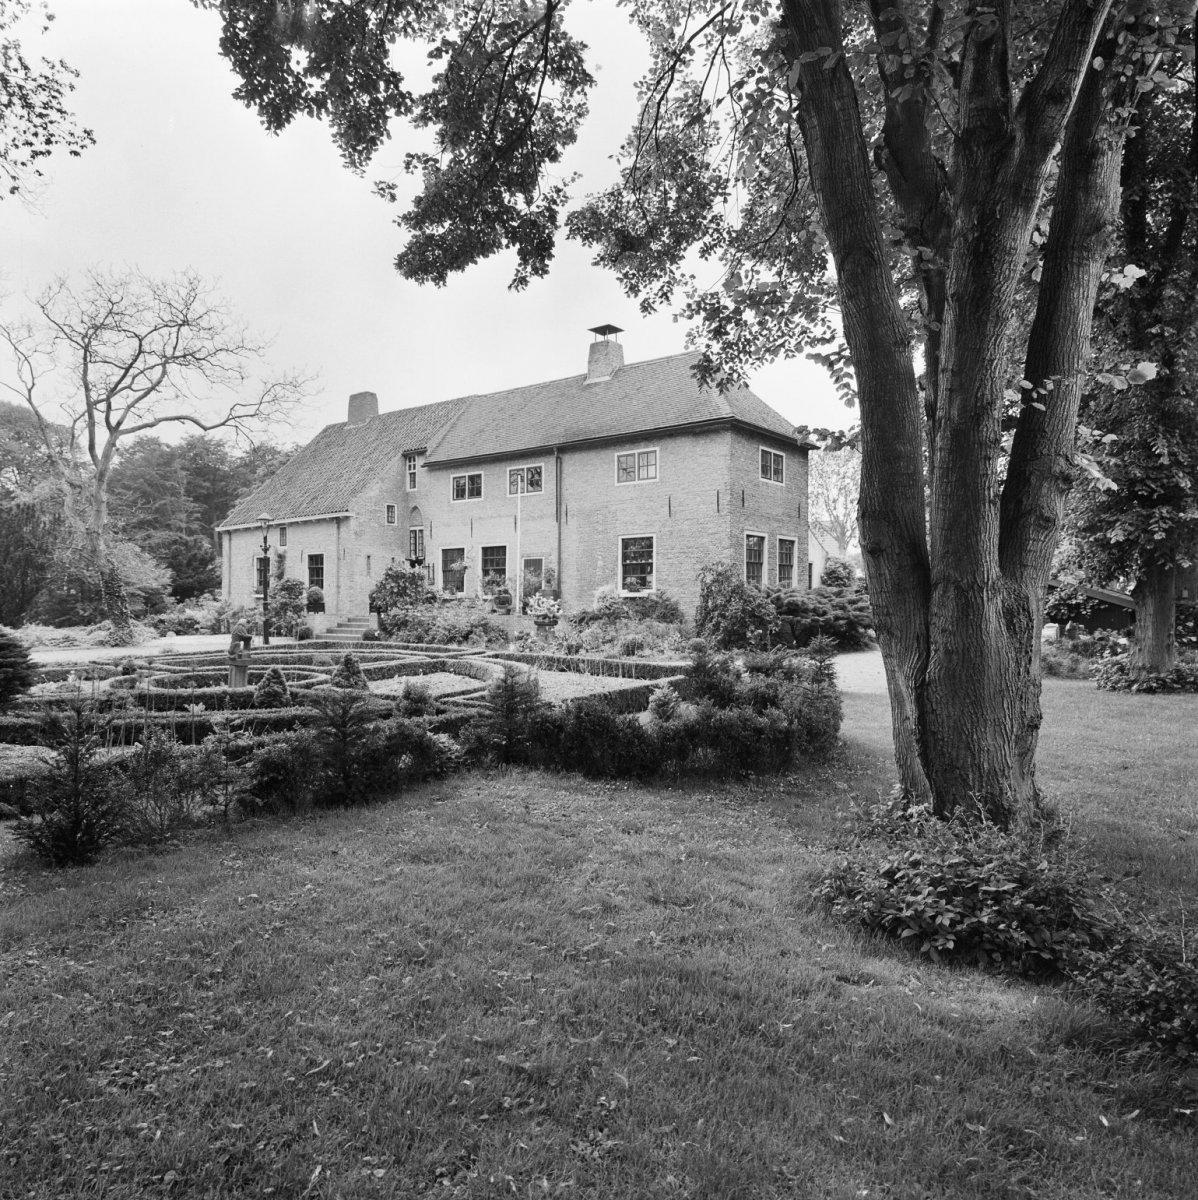 File exterieur overzicht voorgevel oostvoorne 20267663 wikimedia commons - Huis exterieur picture ...